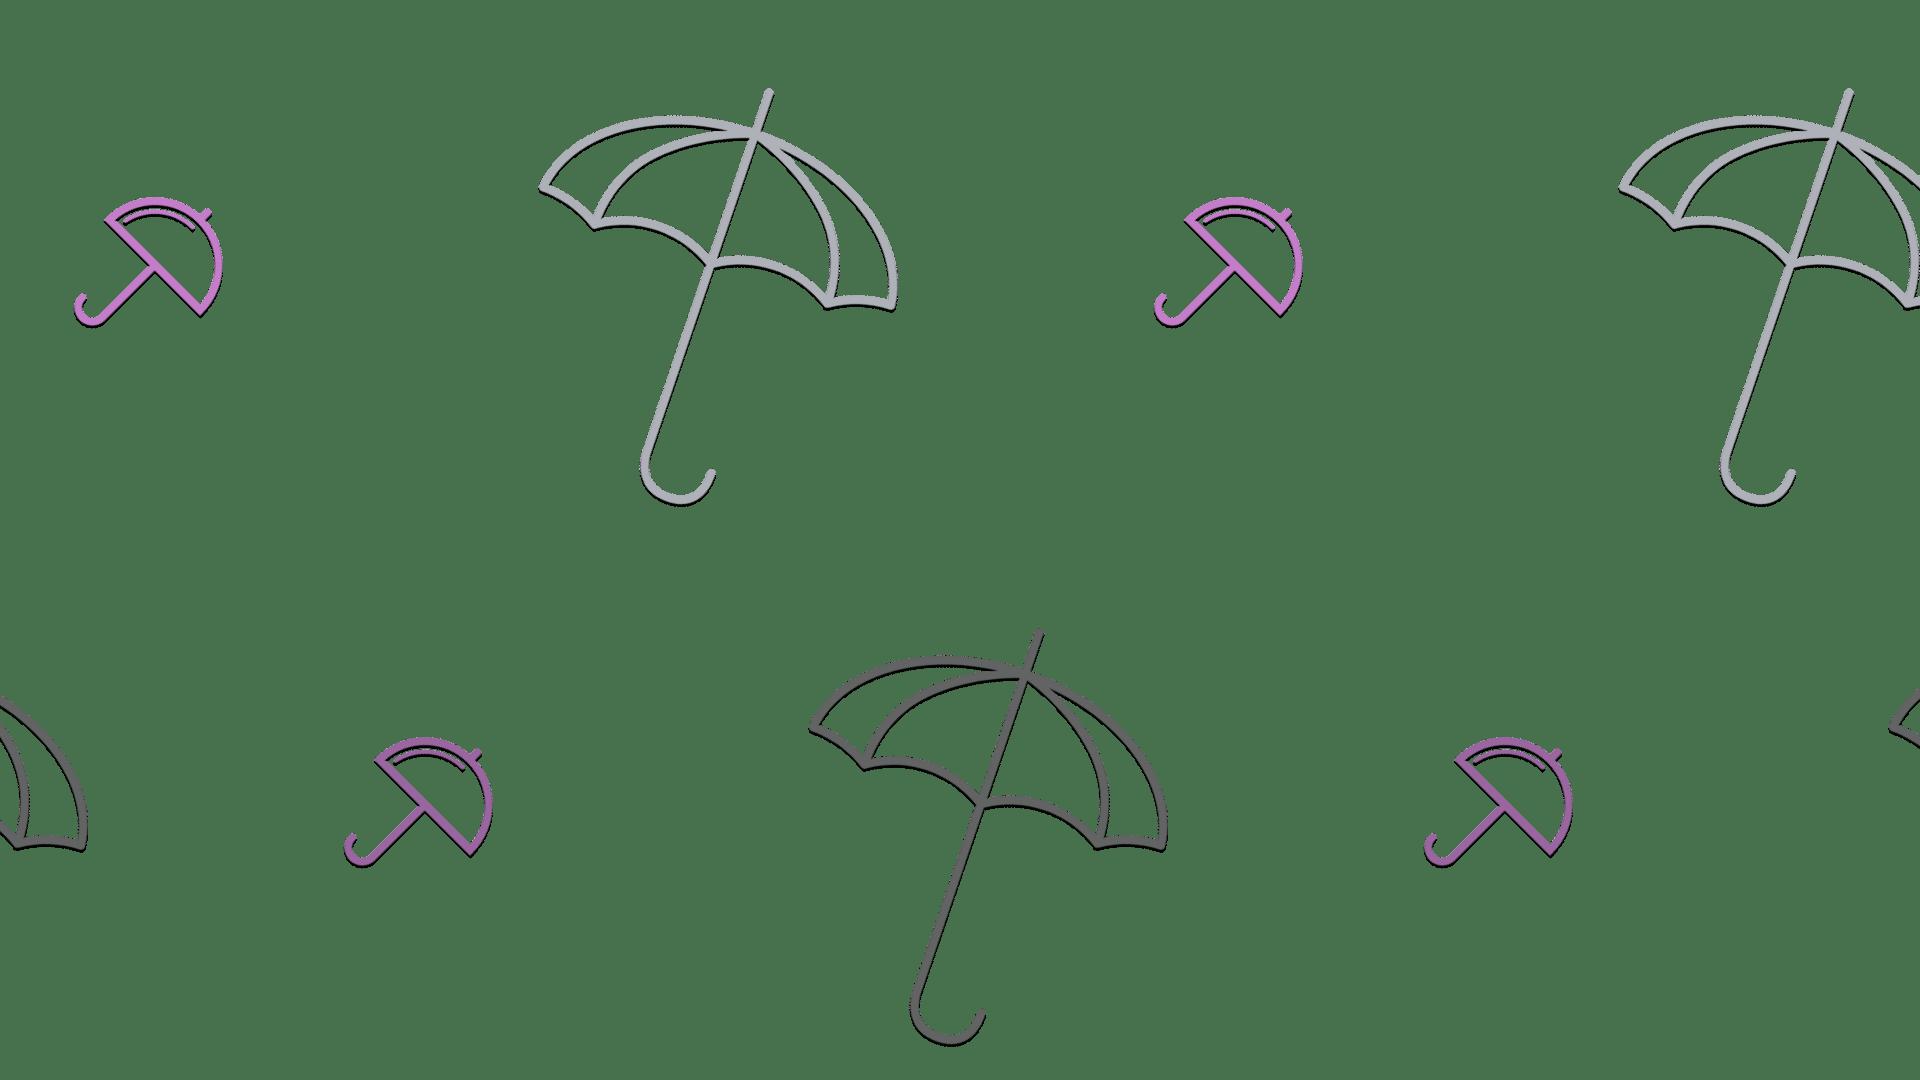 Text, Pink, Purple, Nose, Font, Violet, Product, Fashion, Accessory, Diagram, Line, Rainy, Weather,  Free Image